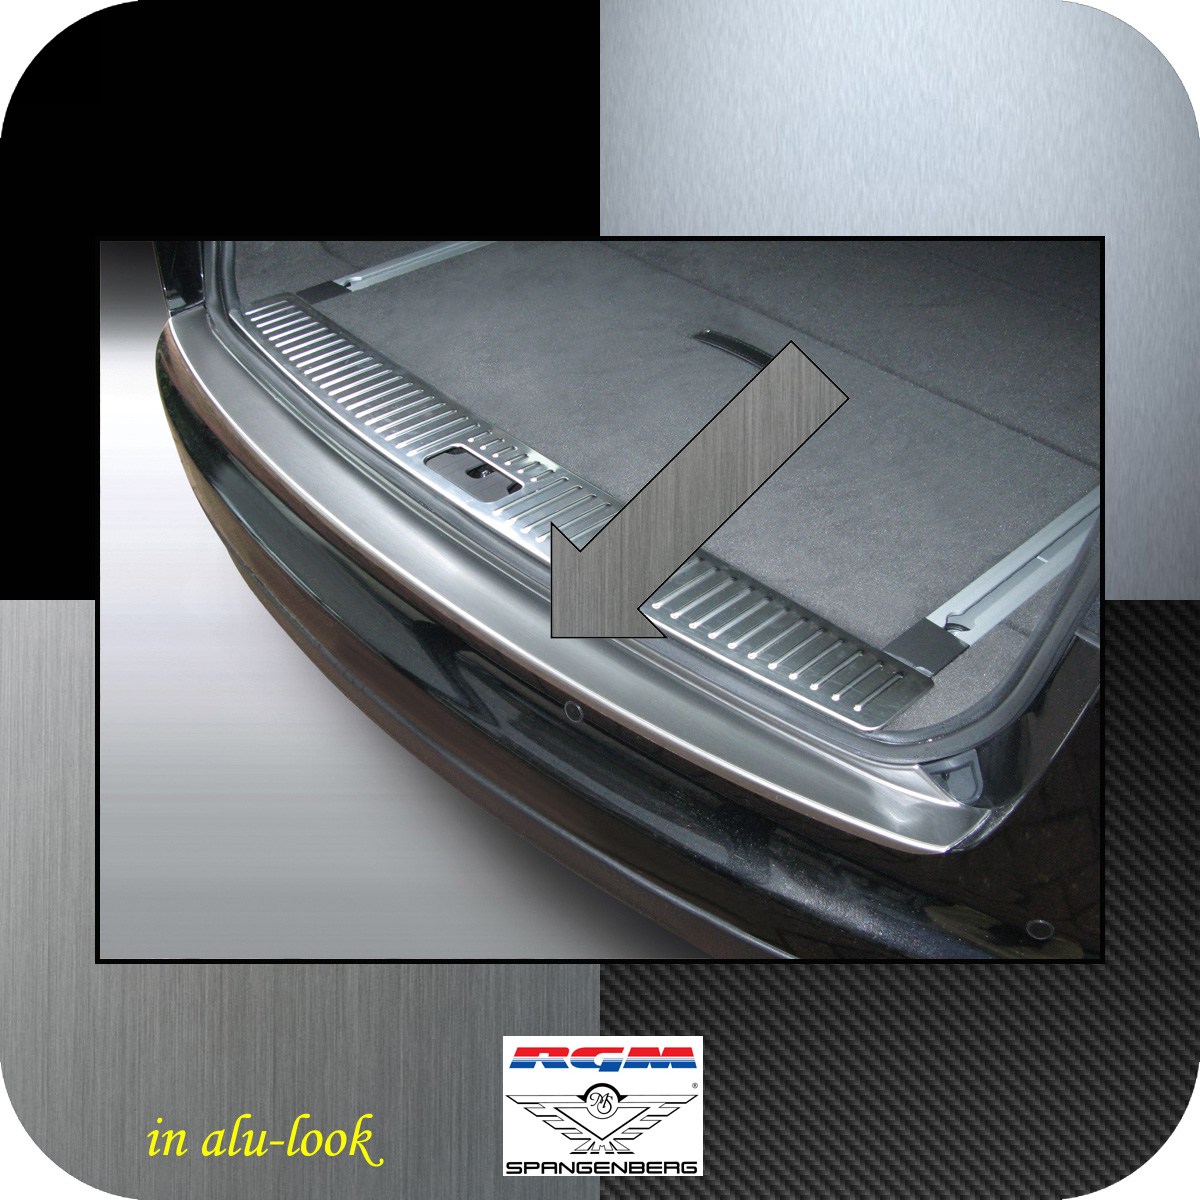 Ladekantenschutz Alu-Look Jaguar XF Sportbrake I X250 Kombi 2012-2014 3504608